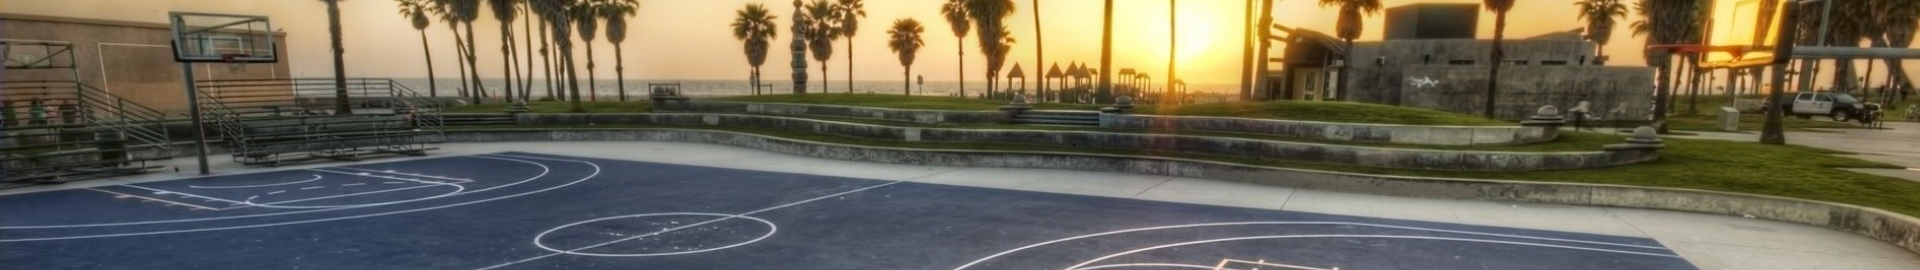 Merchandising NBA Canotte/Cappellini/Felpe | Basket Zone Siena